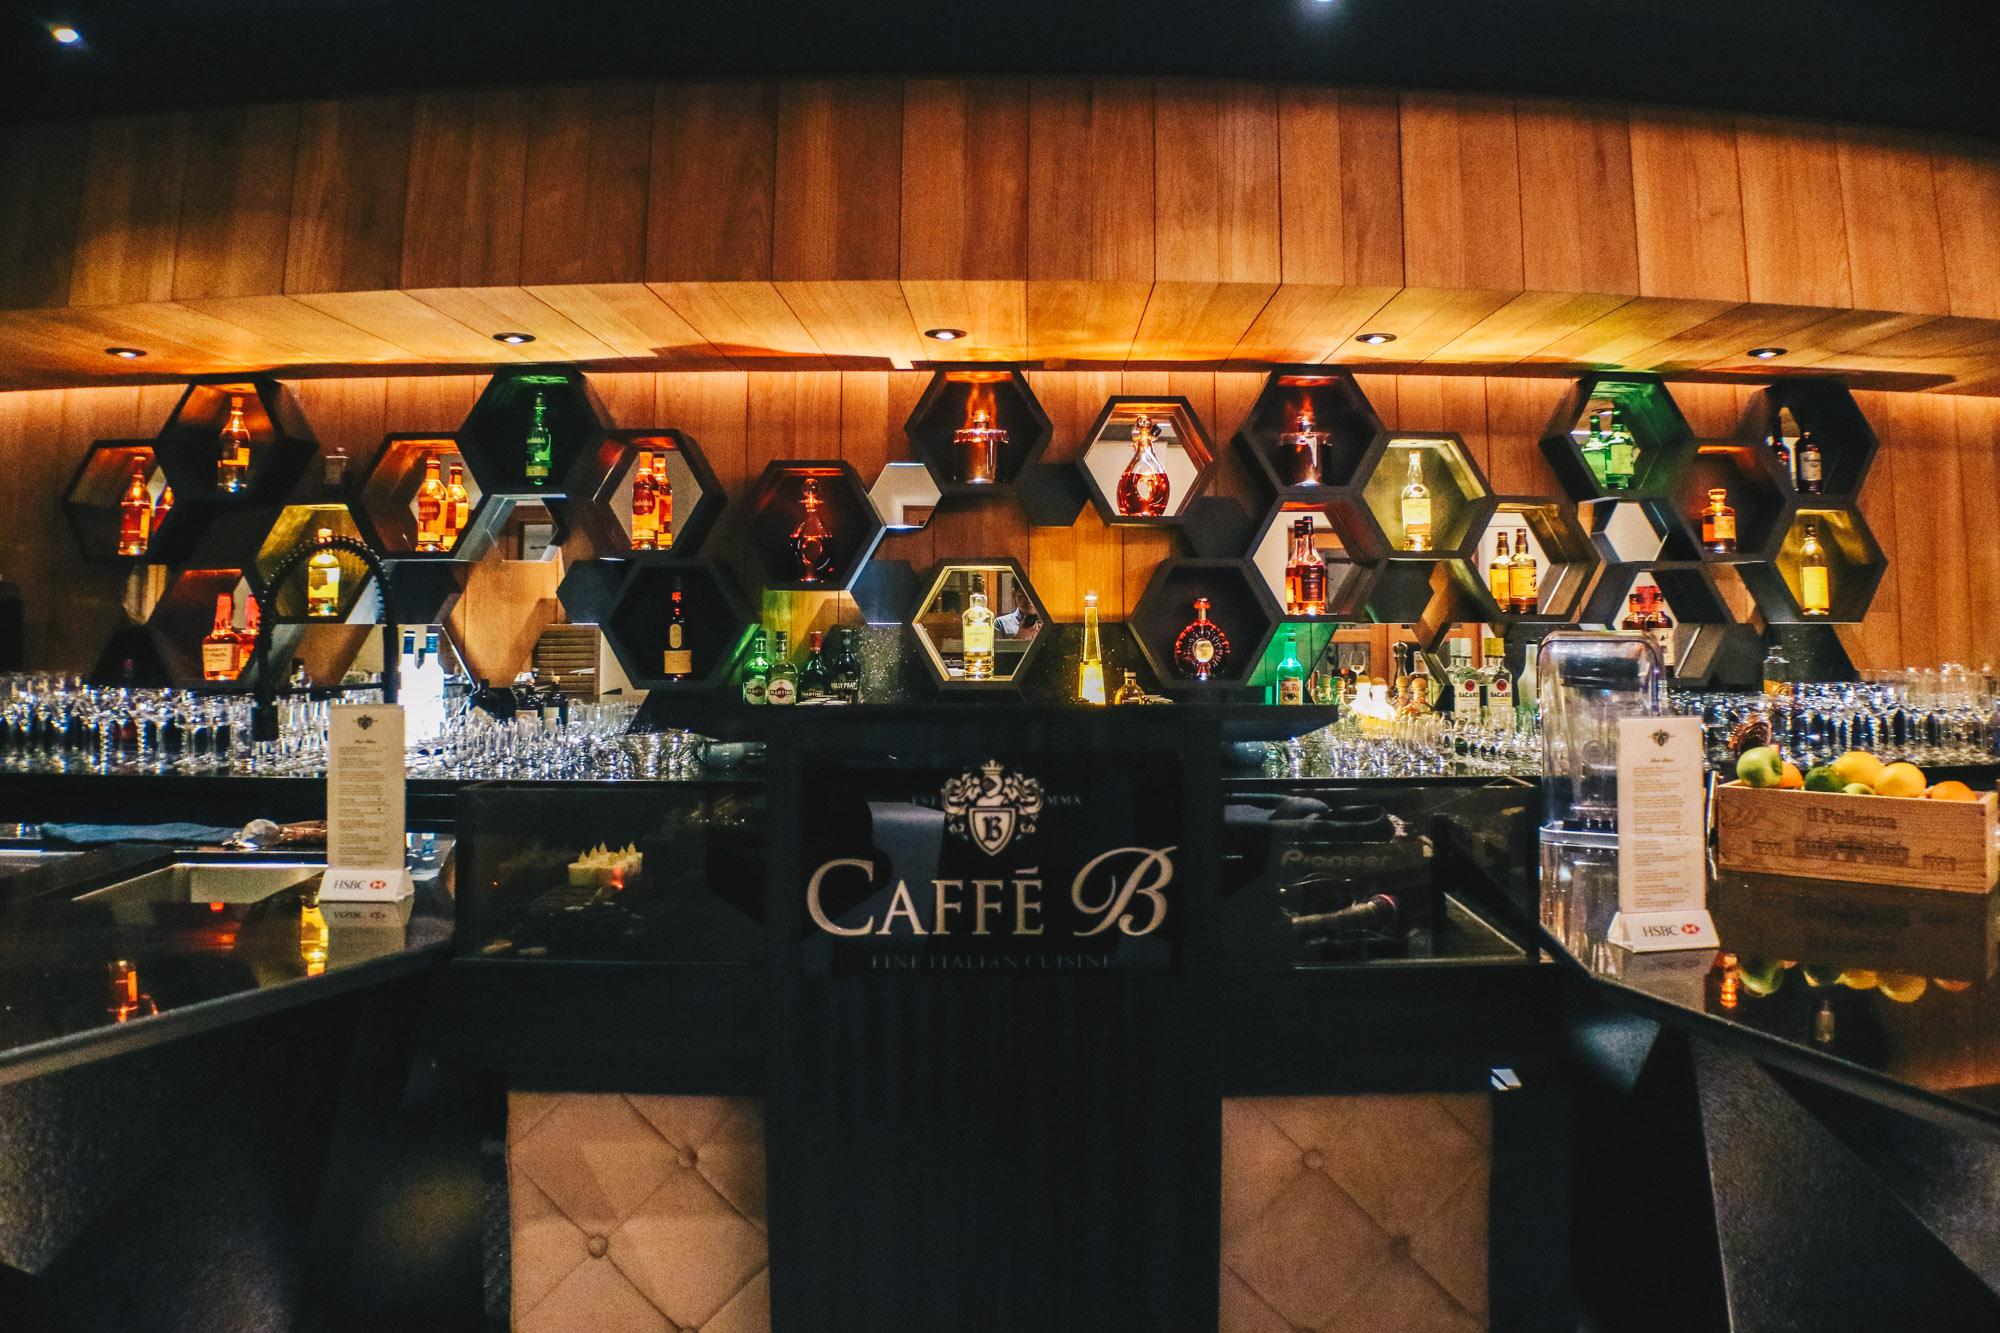 Caffé B – A hidden gem in Club Street